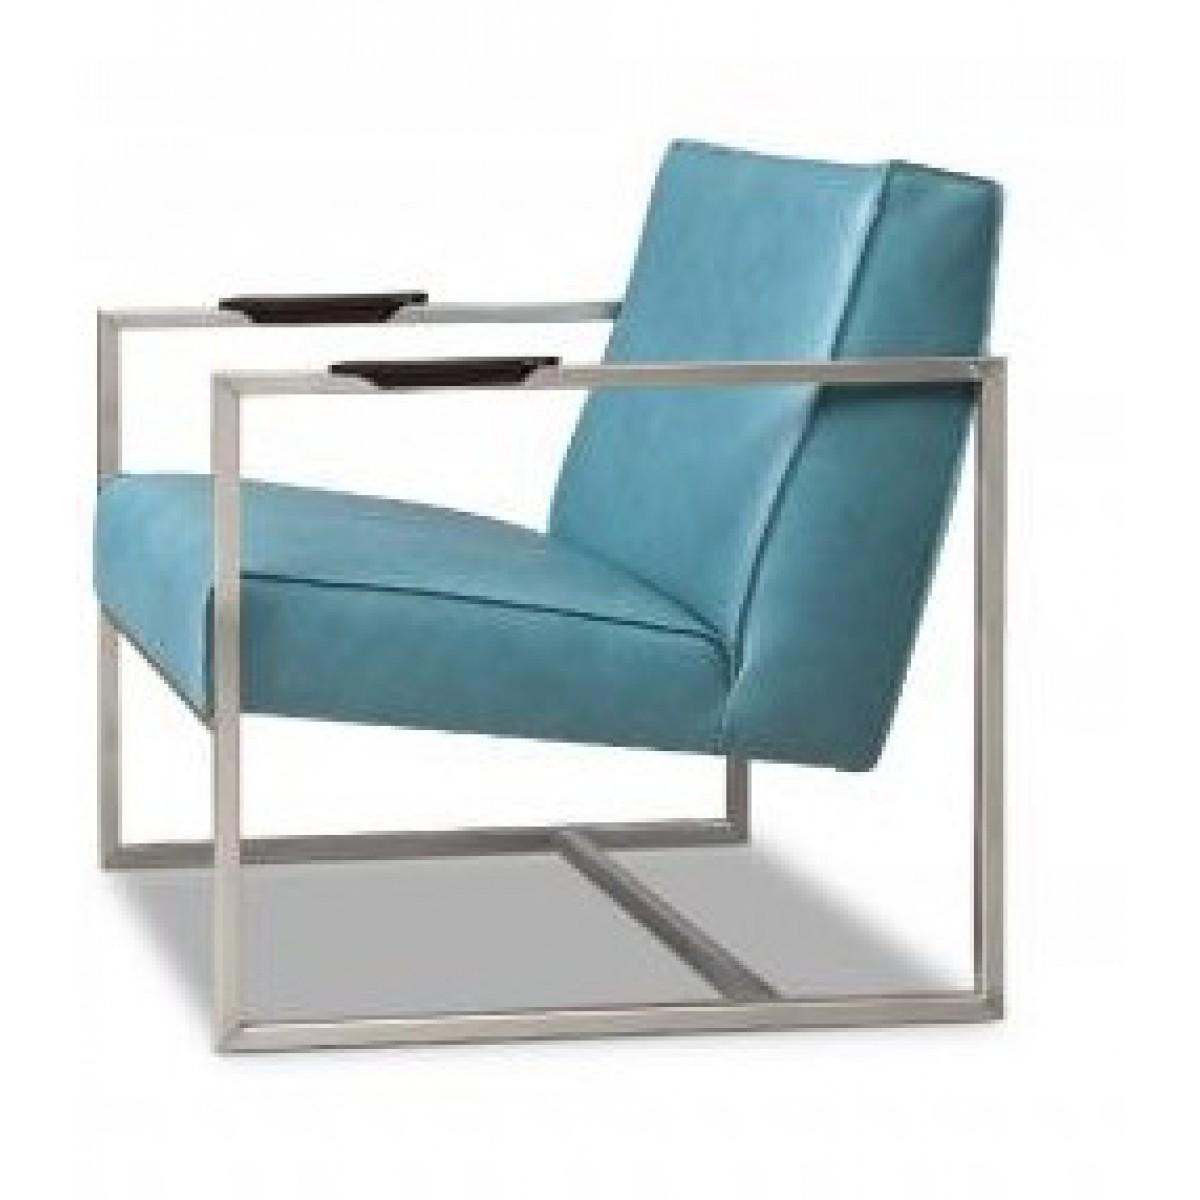 bibi-fauteuil-metaalframe-rvs-leer-leder-silk-petrol